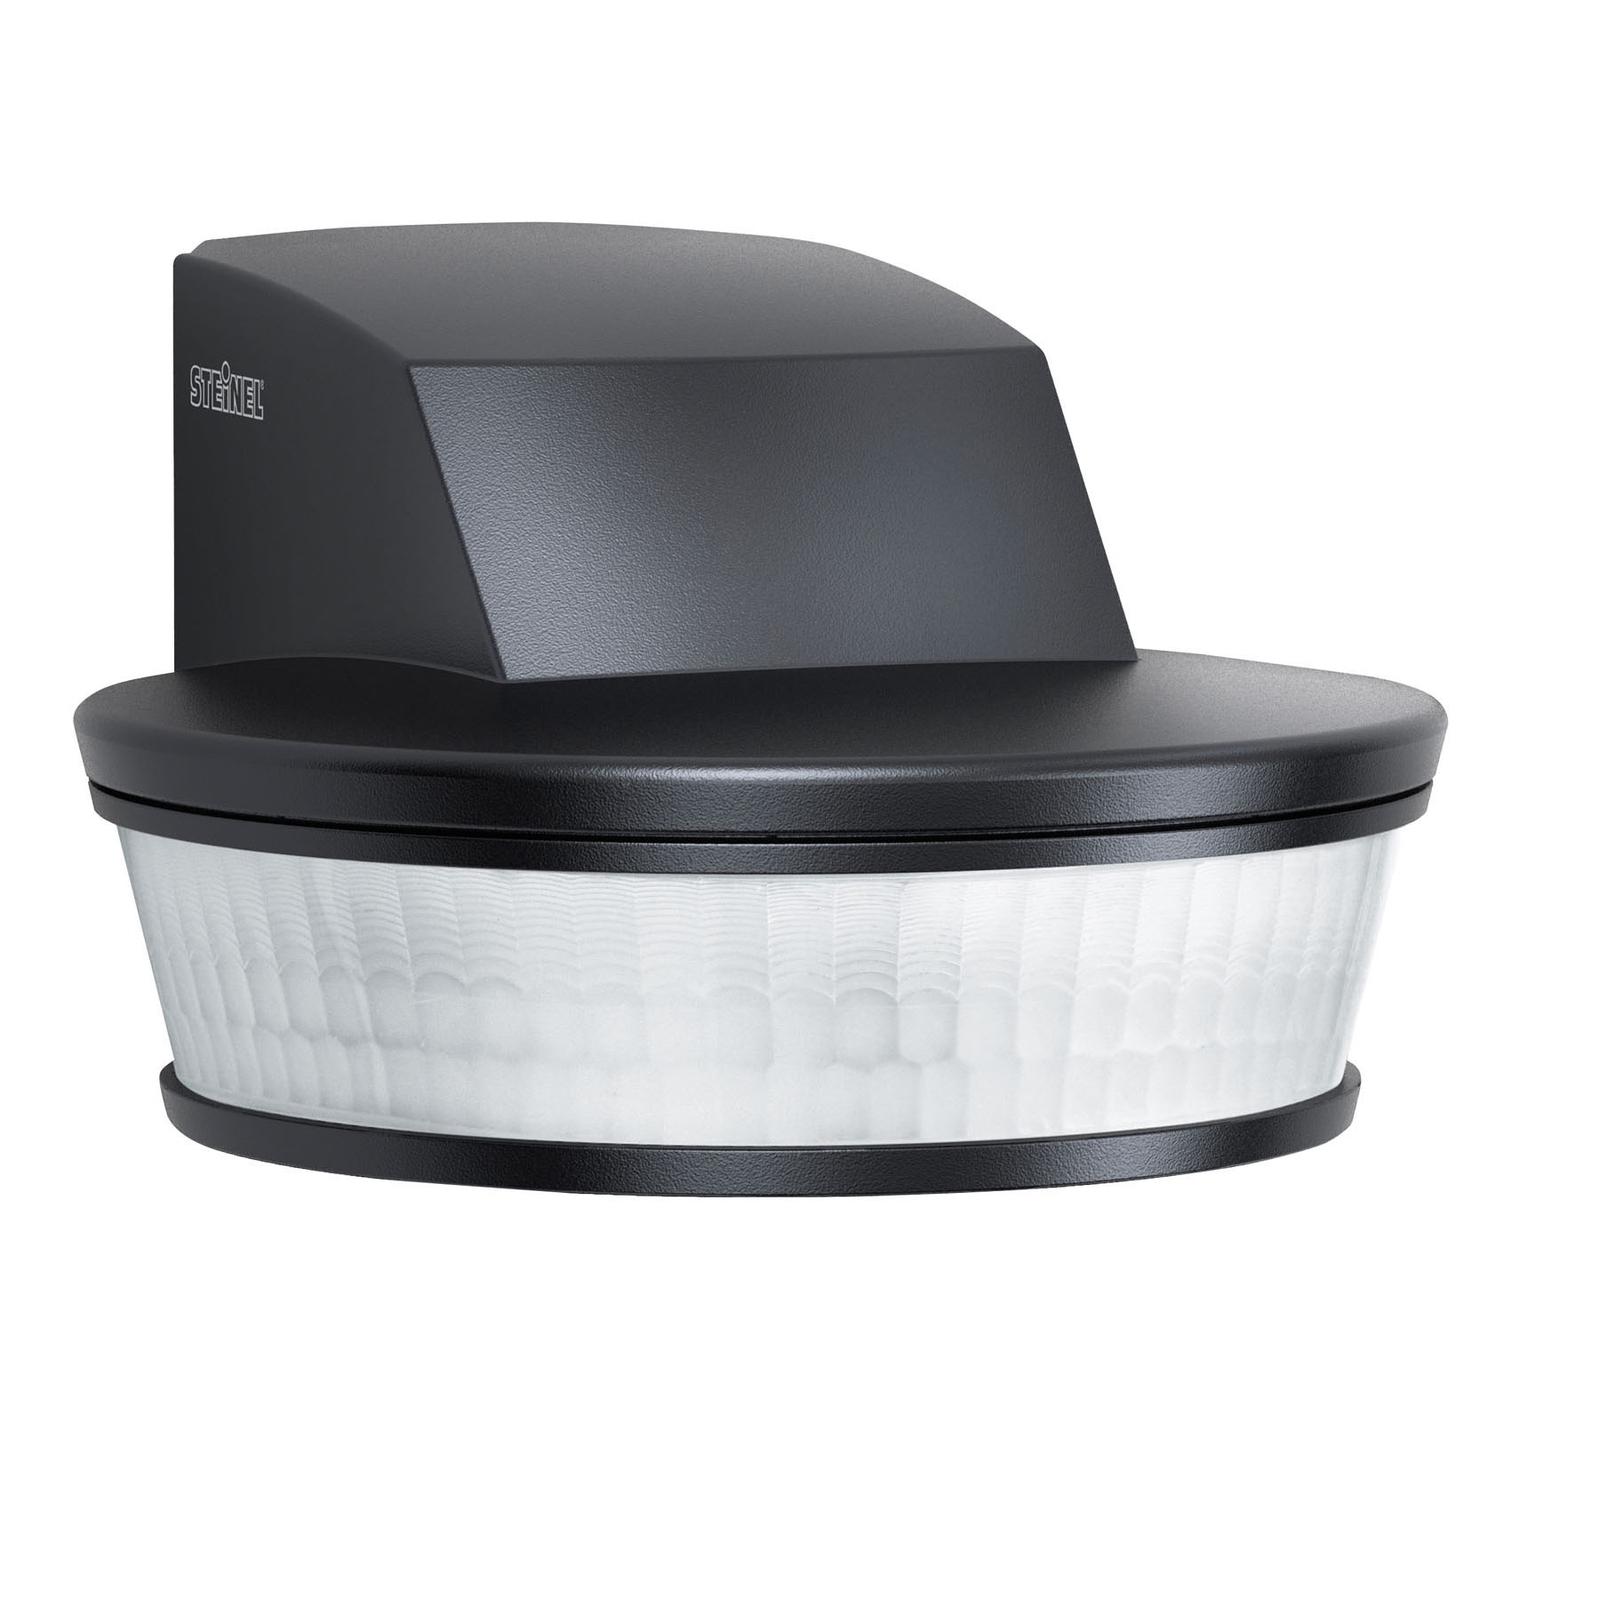 STEINEL SensIQ S rörelsesensor, svart